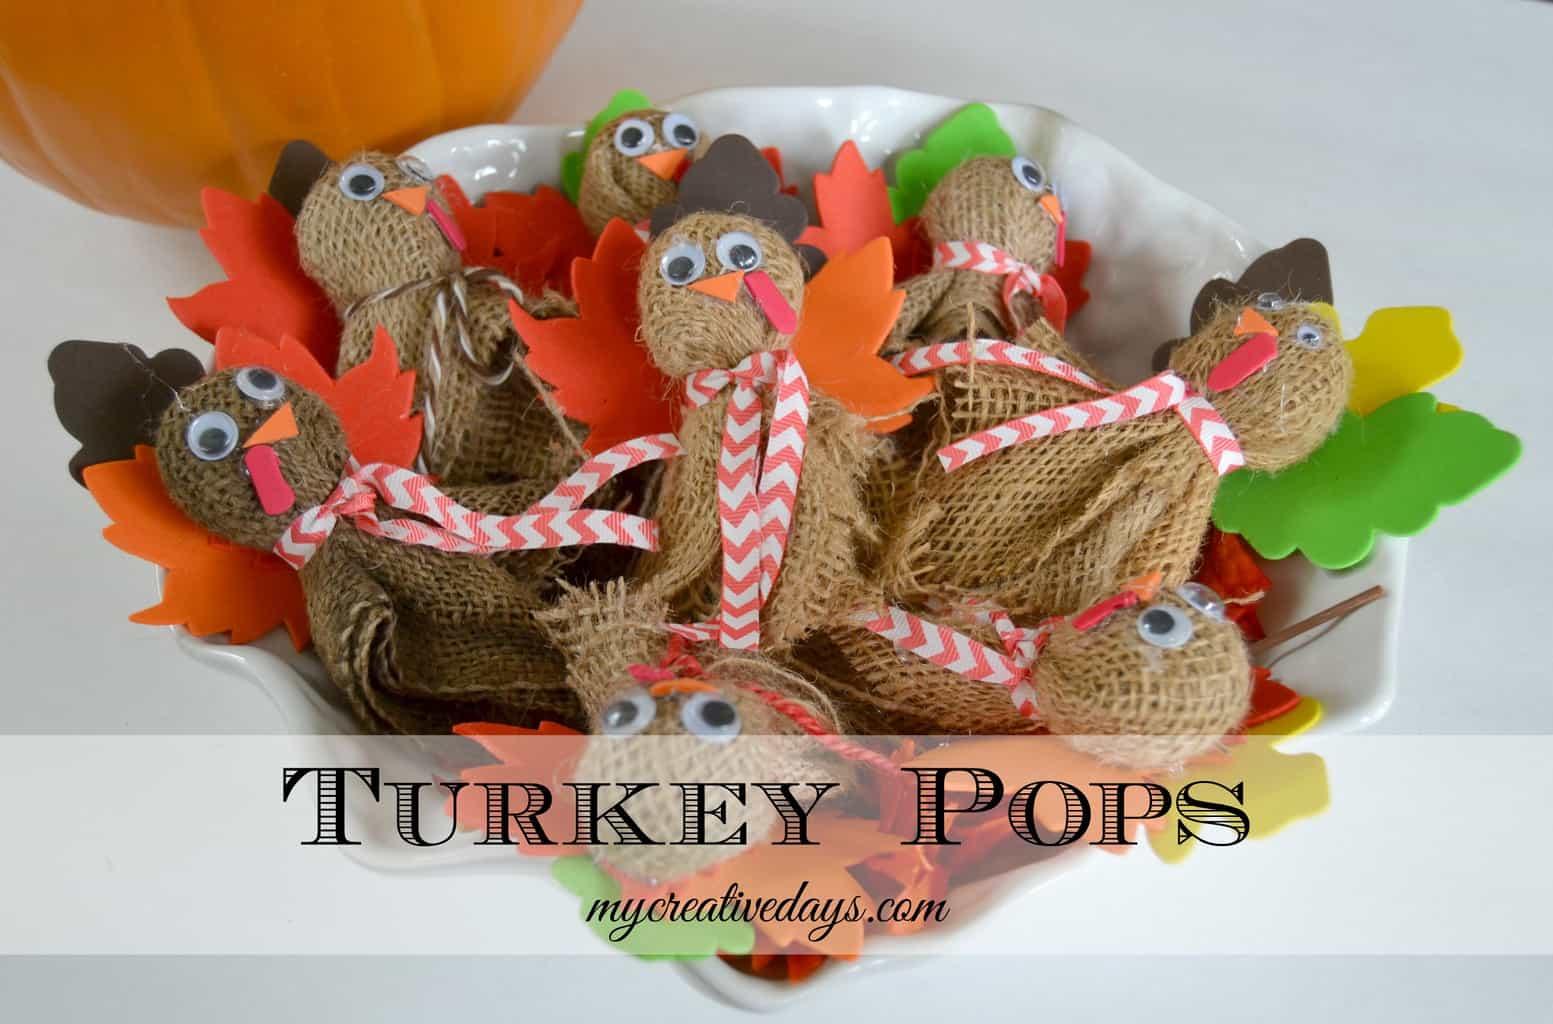 Turkey Pops mycreativedays.com